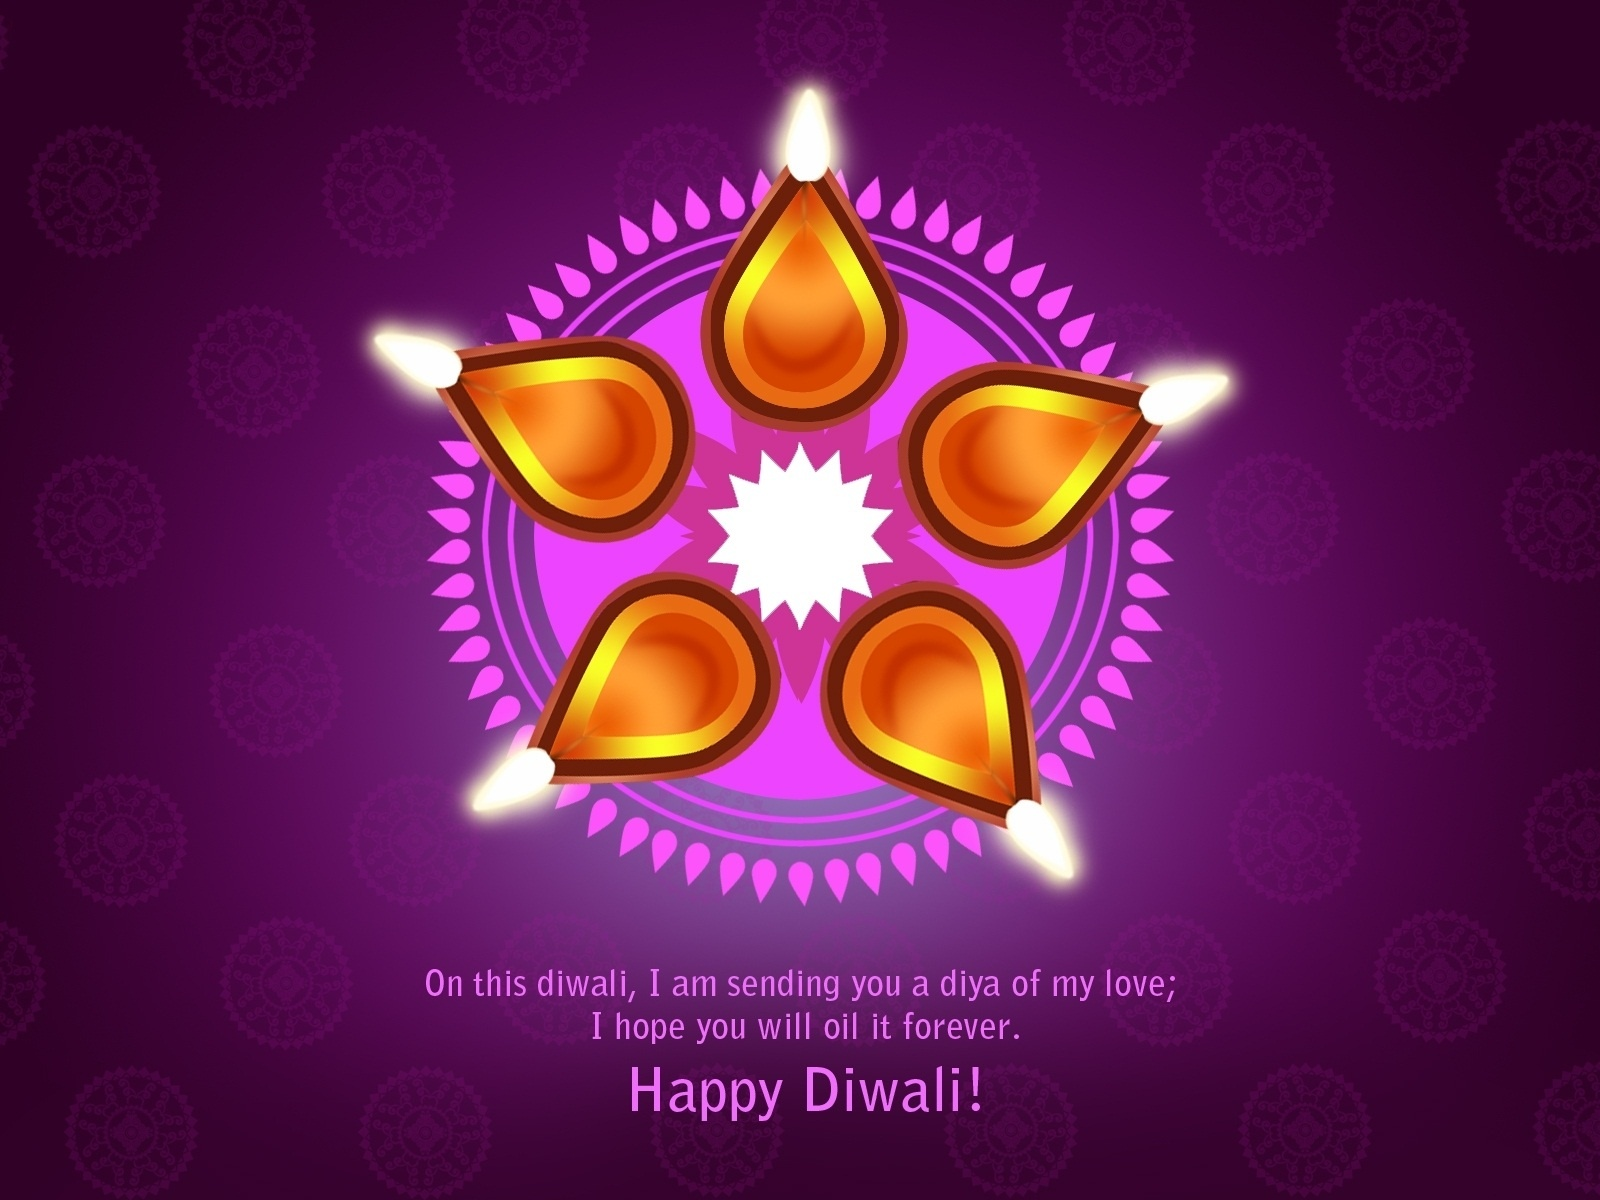 Happy diwali images 2018 mega collection download free happy happy diwali images 2018 m4hsunfo